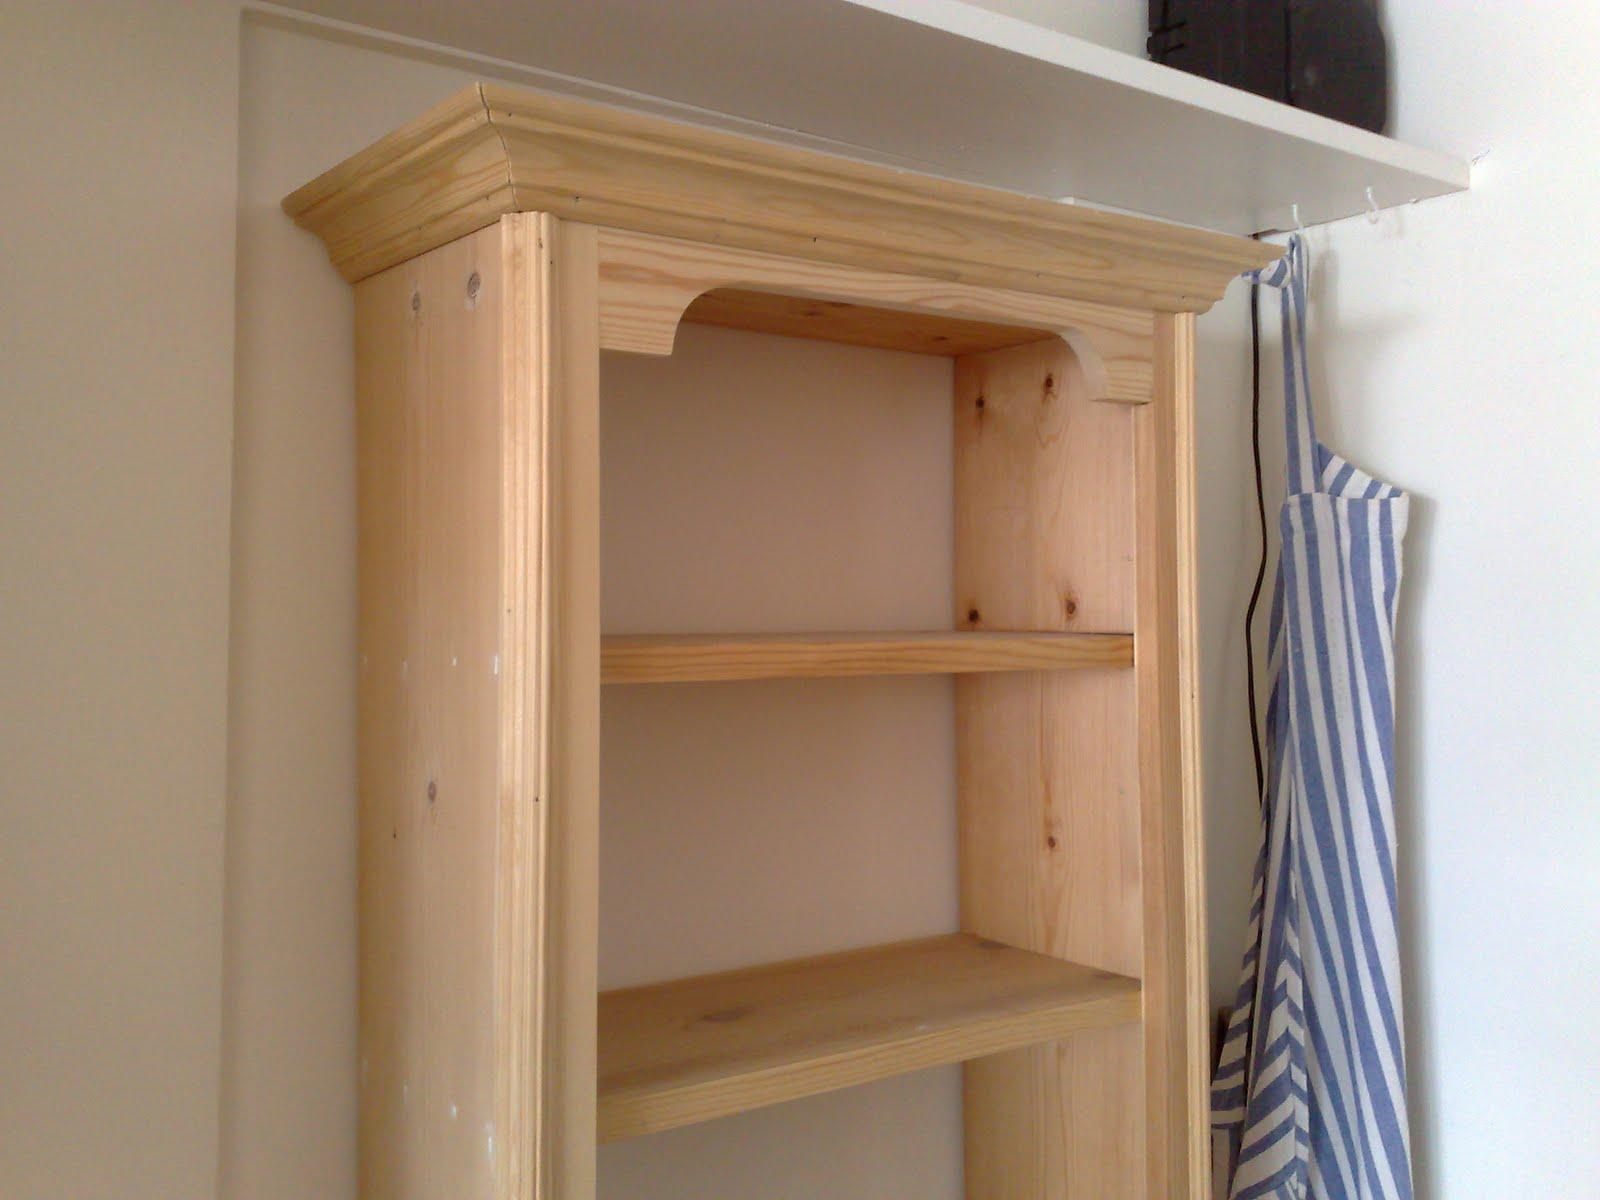 Becky Bell Cabinetmaker Bespoke kitchens London: Free